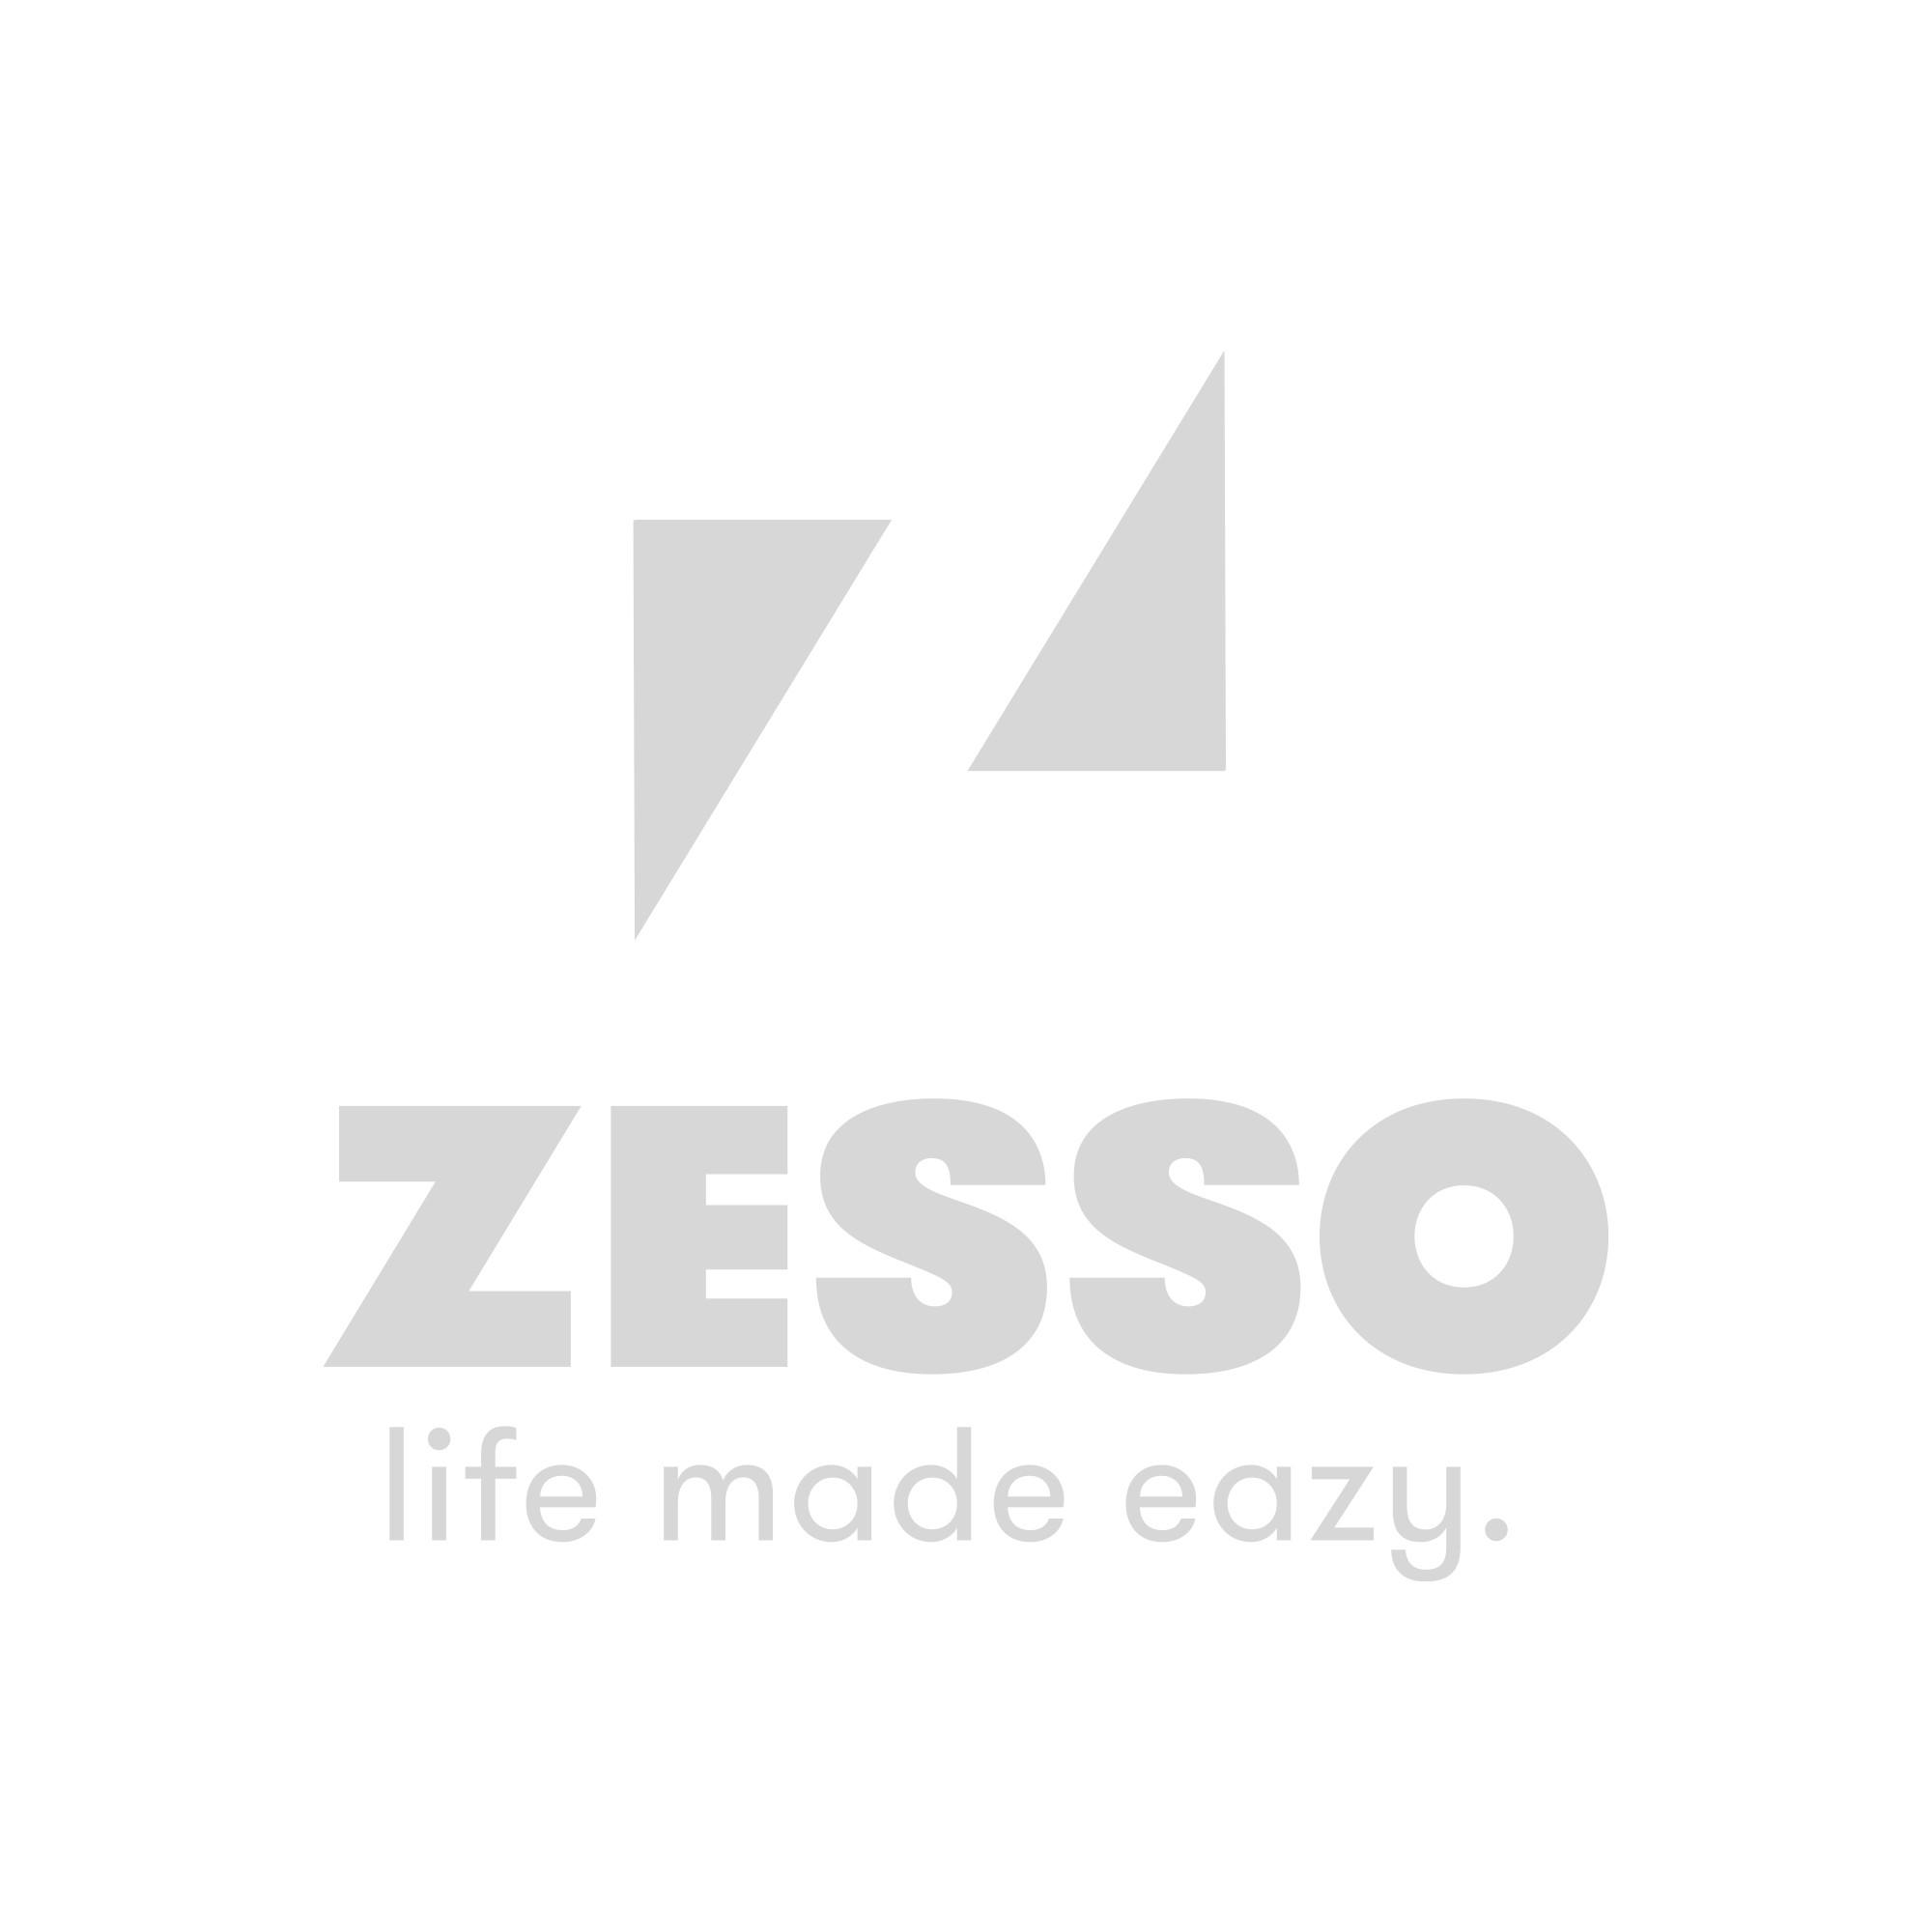 Baninni Kinderwagen Ayo 3 in 1 Inspire - Limited Edition